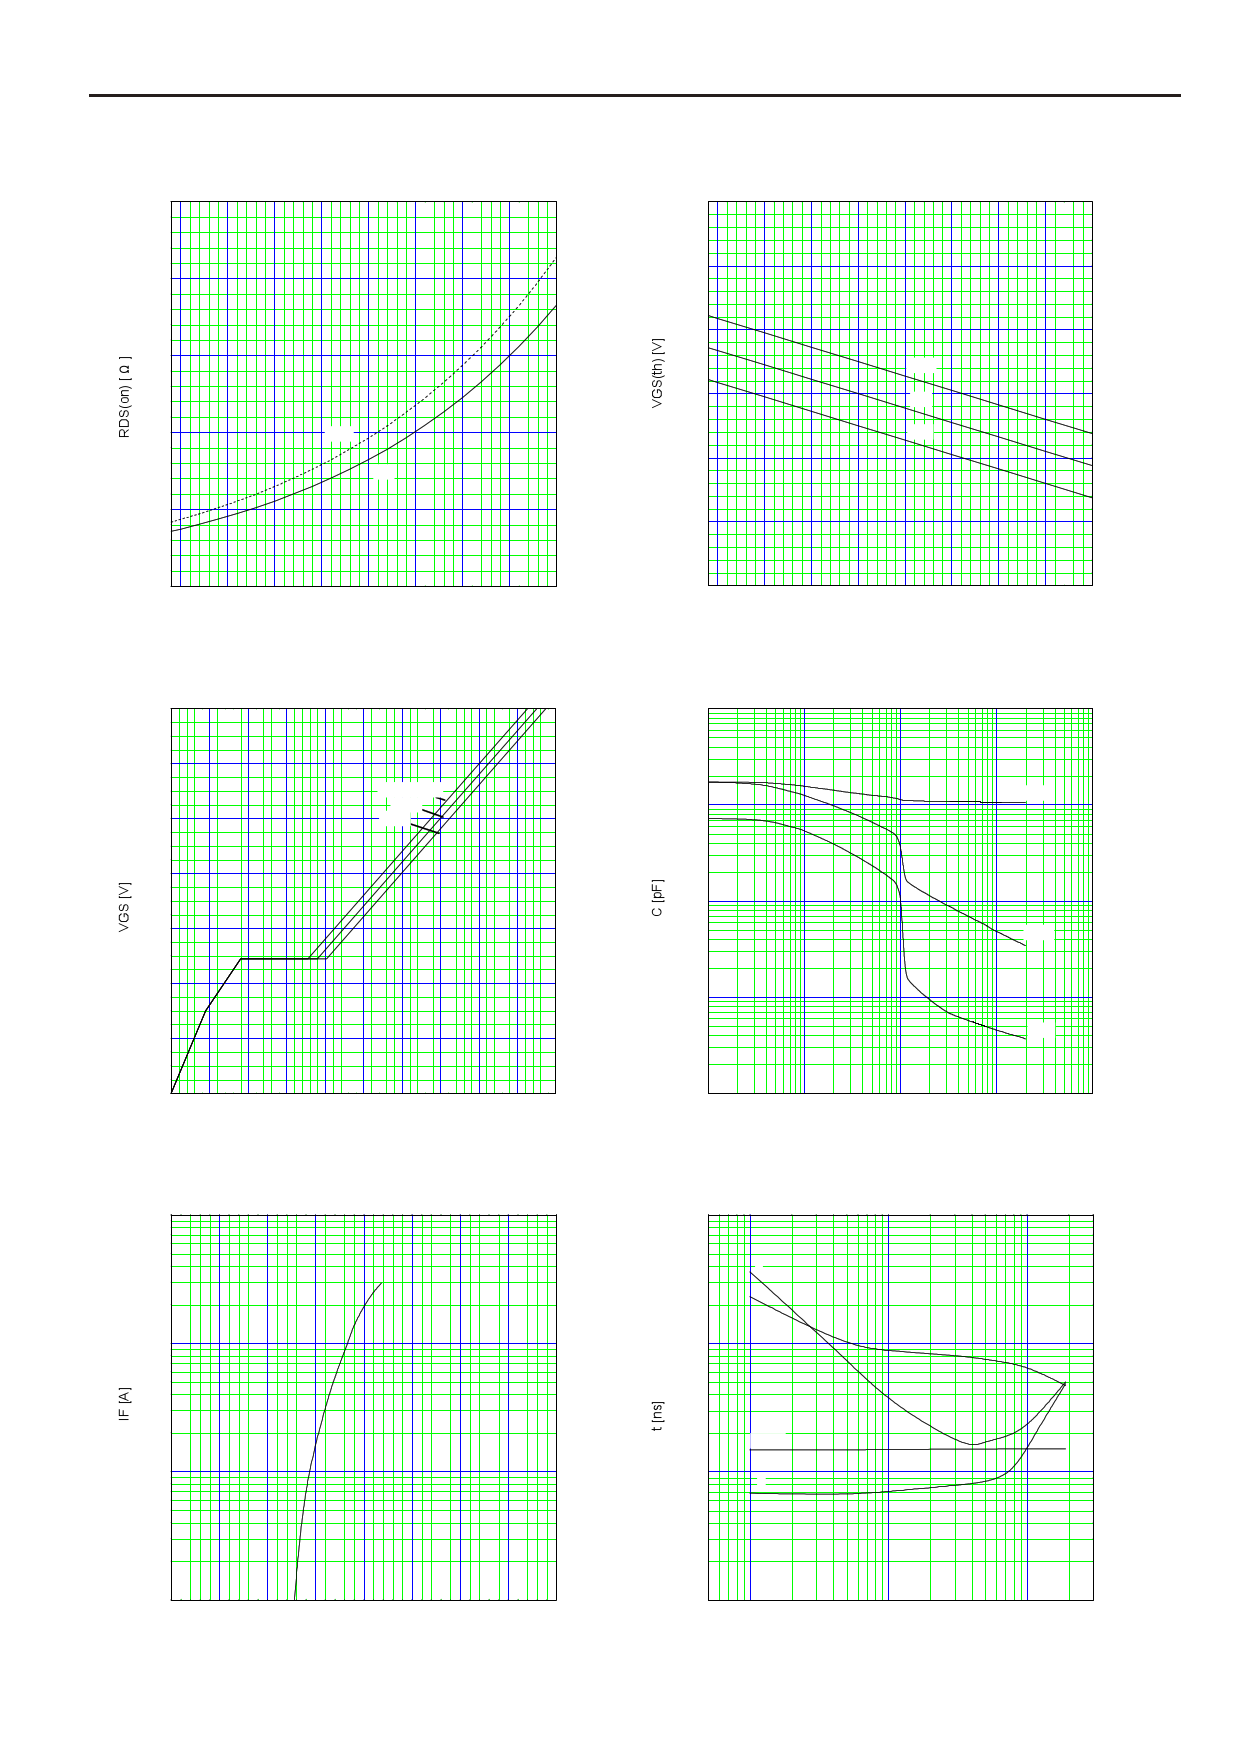 08N50E pdf, ピン配列